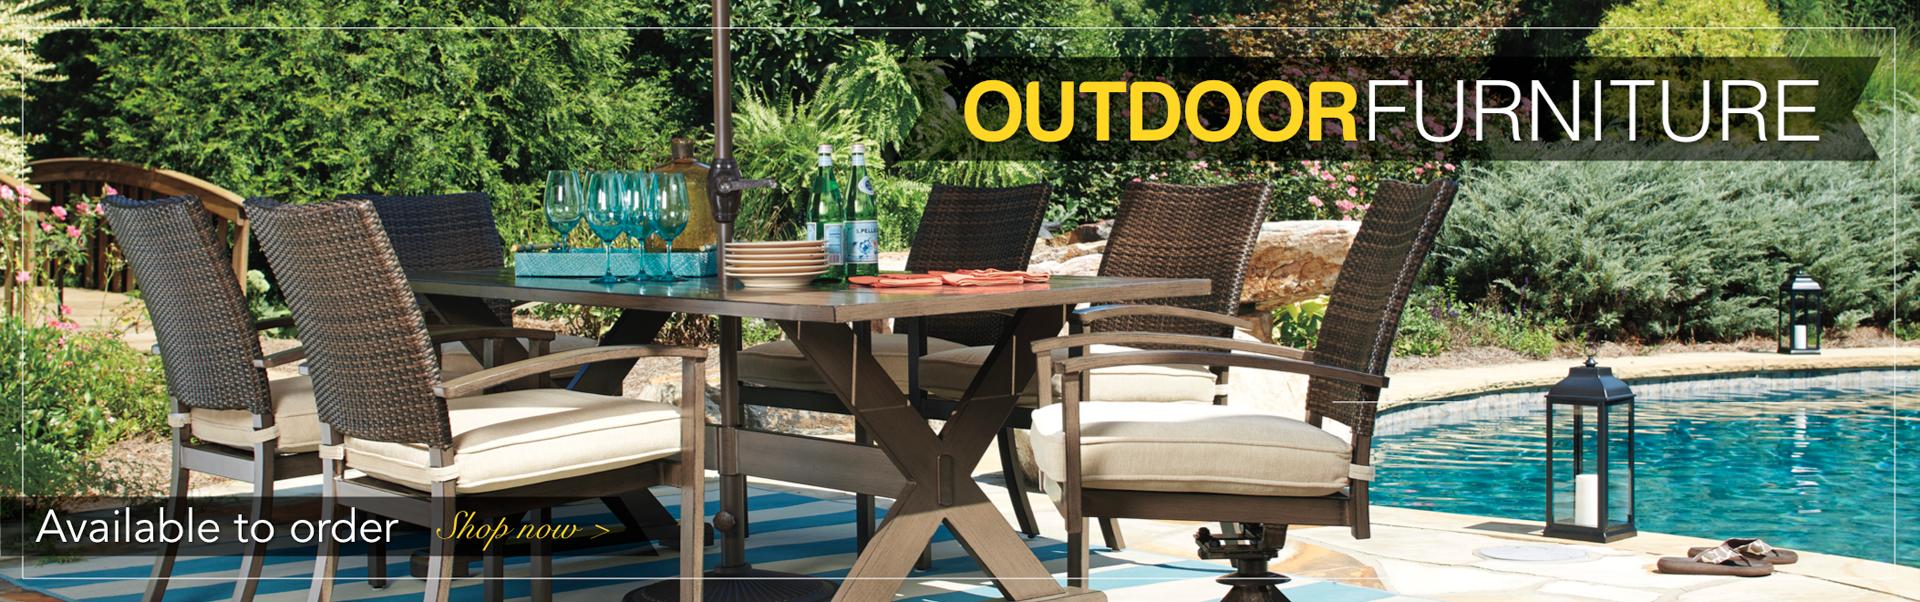 Outdoor Furniture at Del Sol Furniture in Phoenix